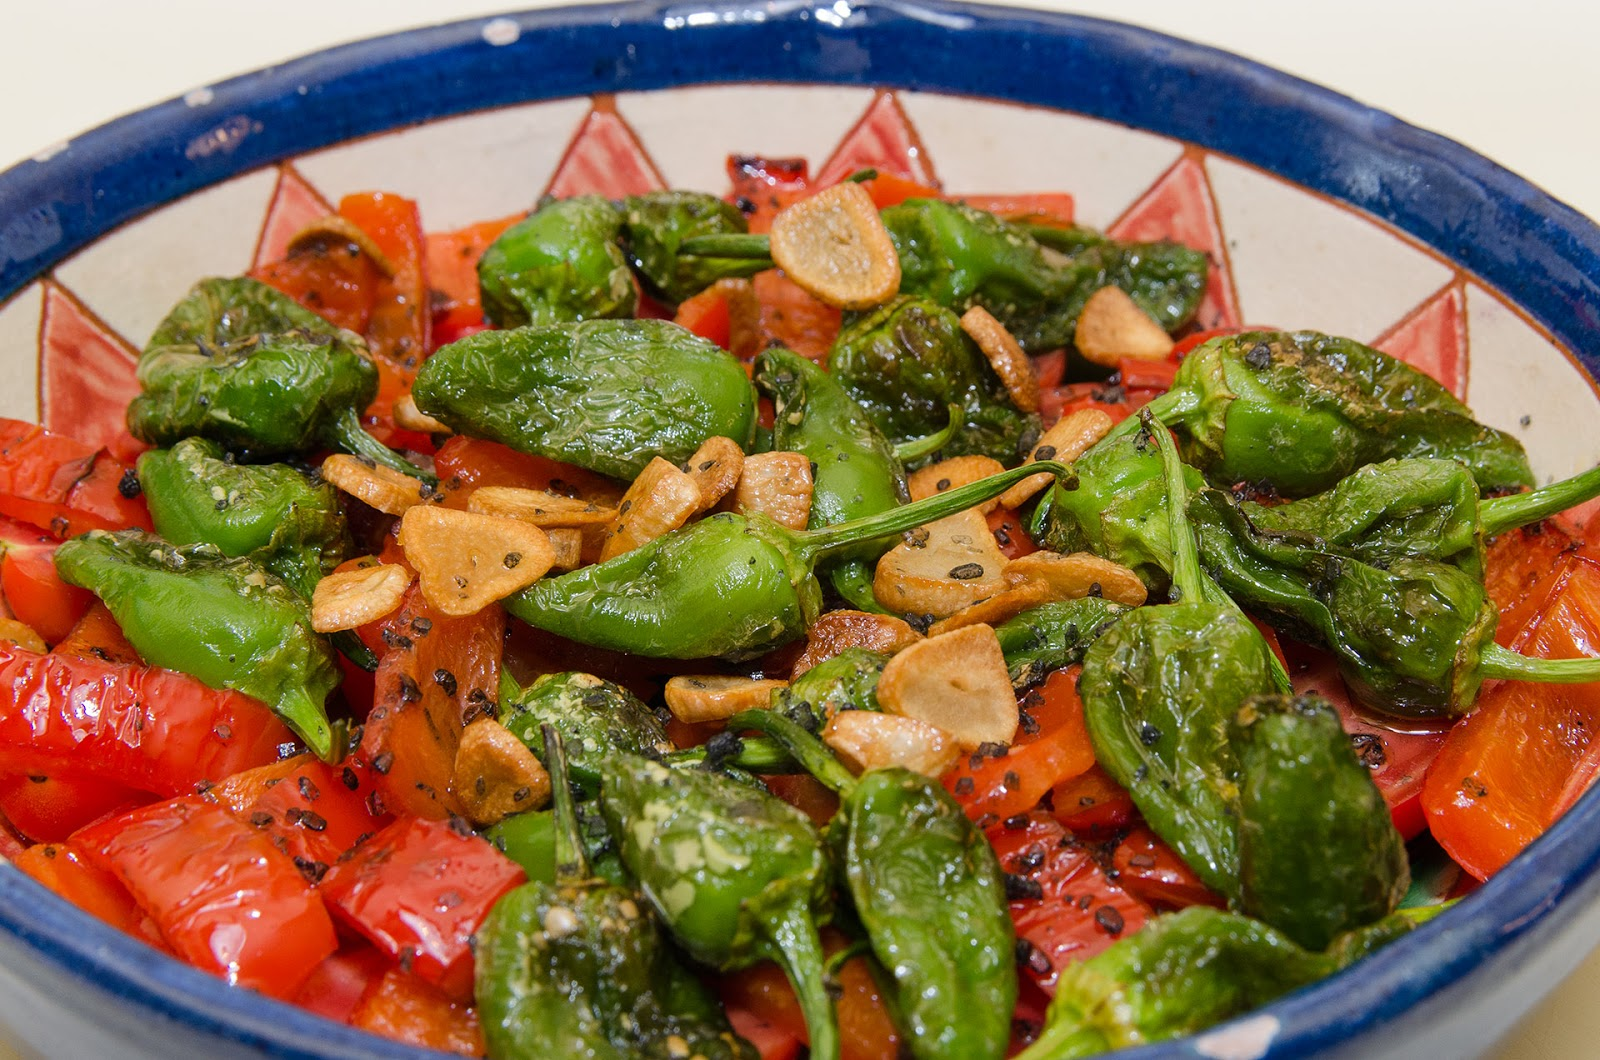 receta-ensalada-pimientos-padron-tomates-cherry-cocina-ligera-baja-grasa-dieta-adelgazar-facil-sabrosa-bruja